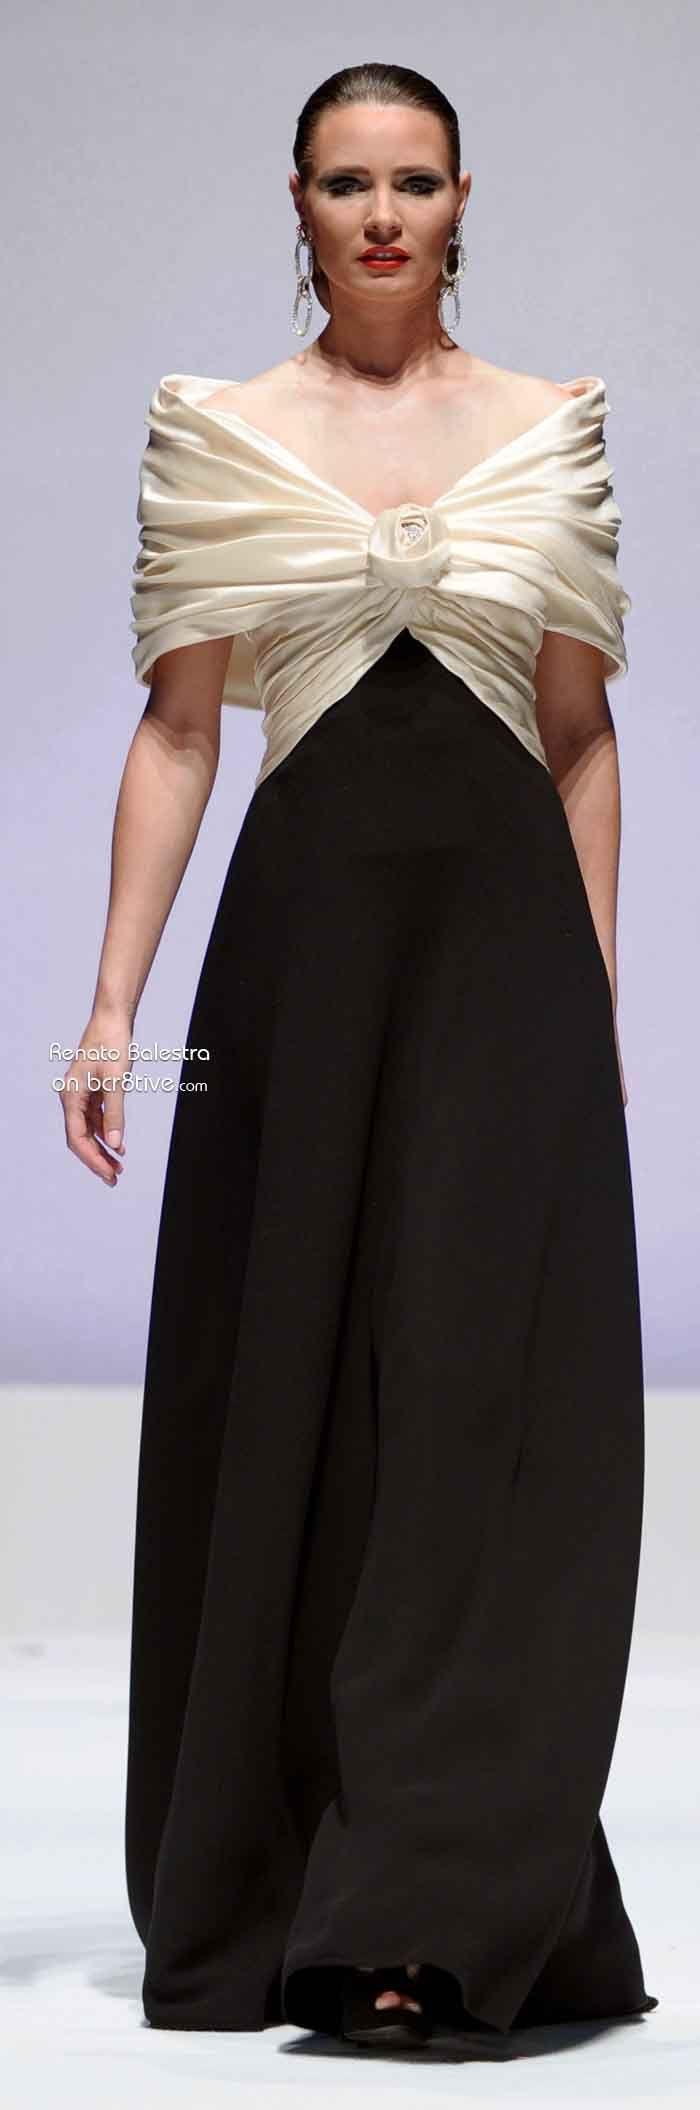 best vestidos largos fiesta images on pinterest evening